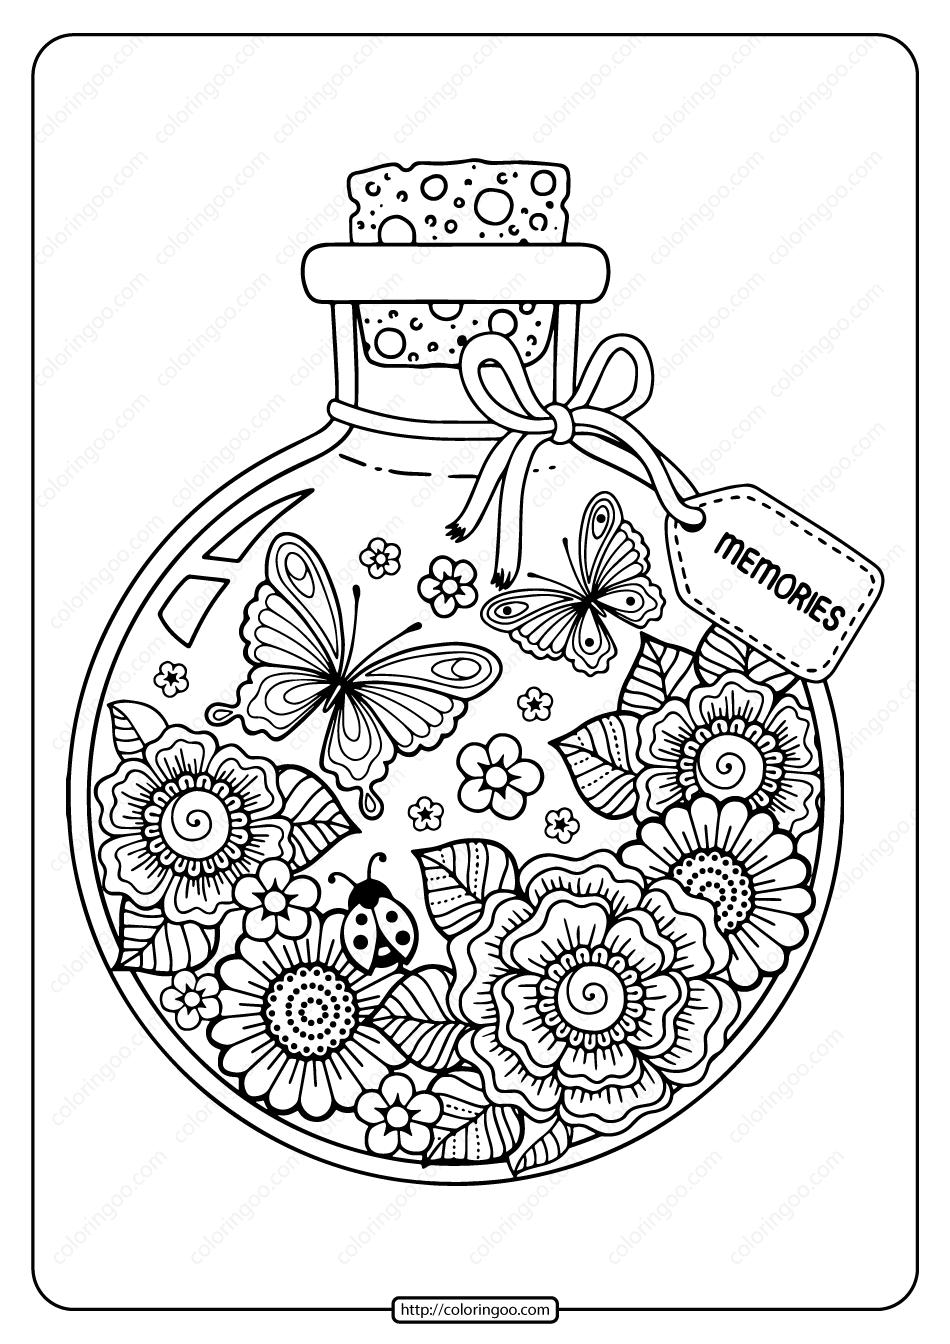 Printable Summer Memories Pdf Coloring Page Bee Coloring Pages Coloring Books Coloring Pages [ 1344 x 950 Pixel ]